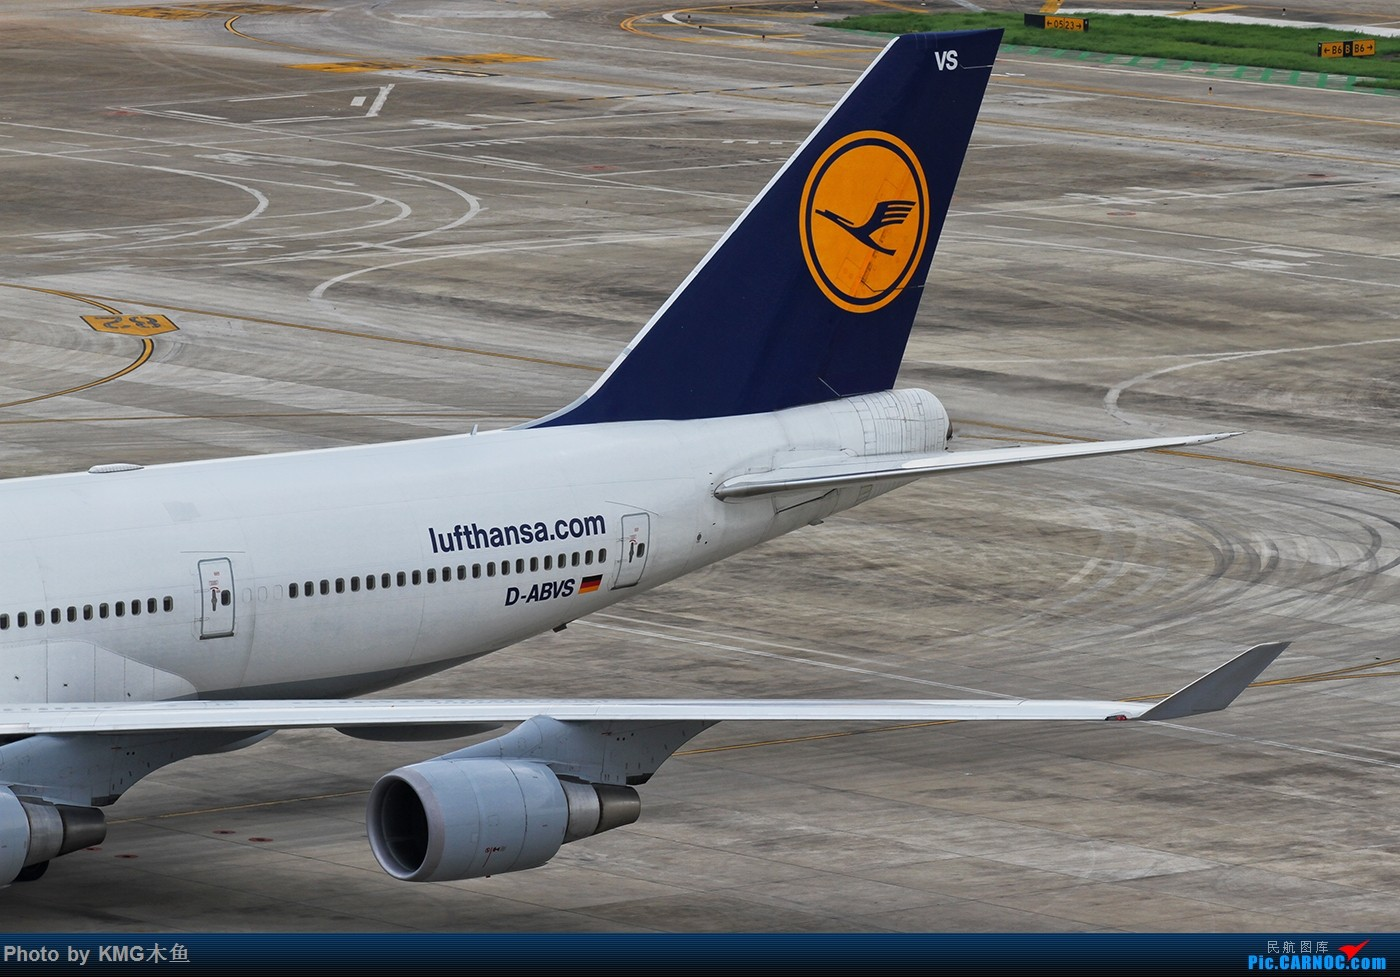 Re:[原创]KMG木鱼能不能到747级别就看各位的小飞机呢 BOEING 747-400 D-ABVS 中国厦门高崎国际机场